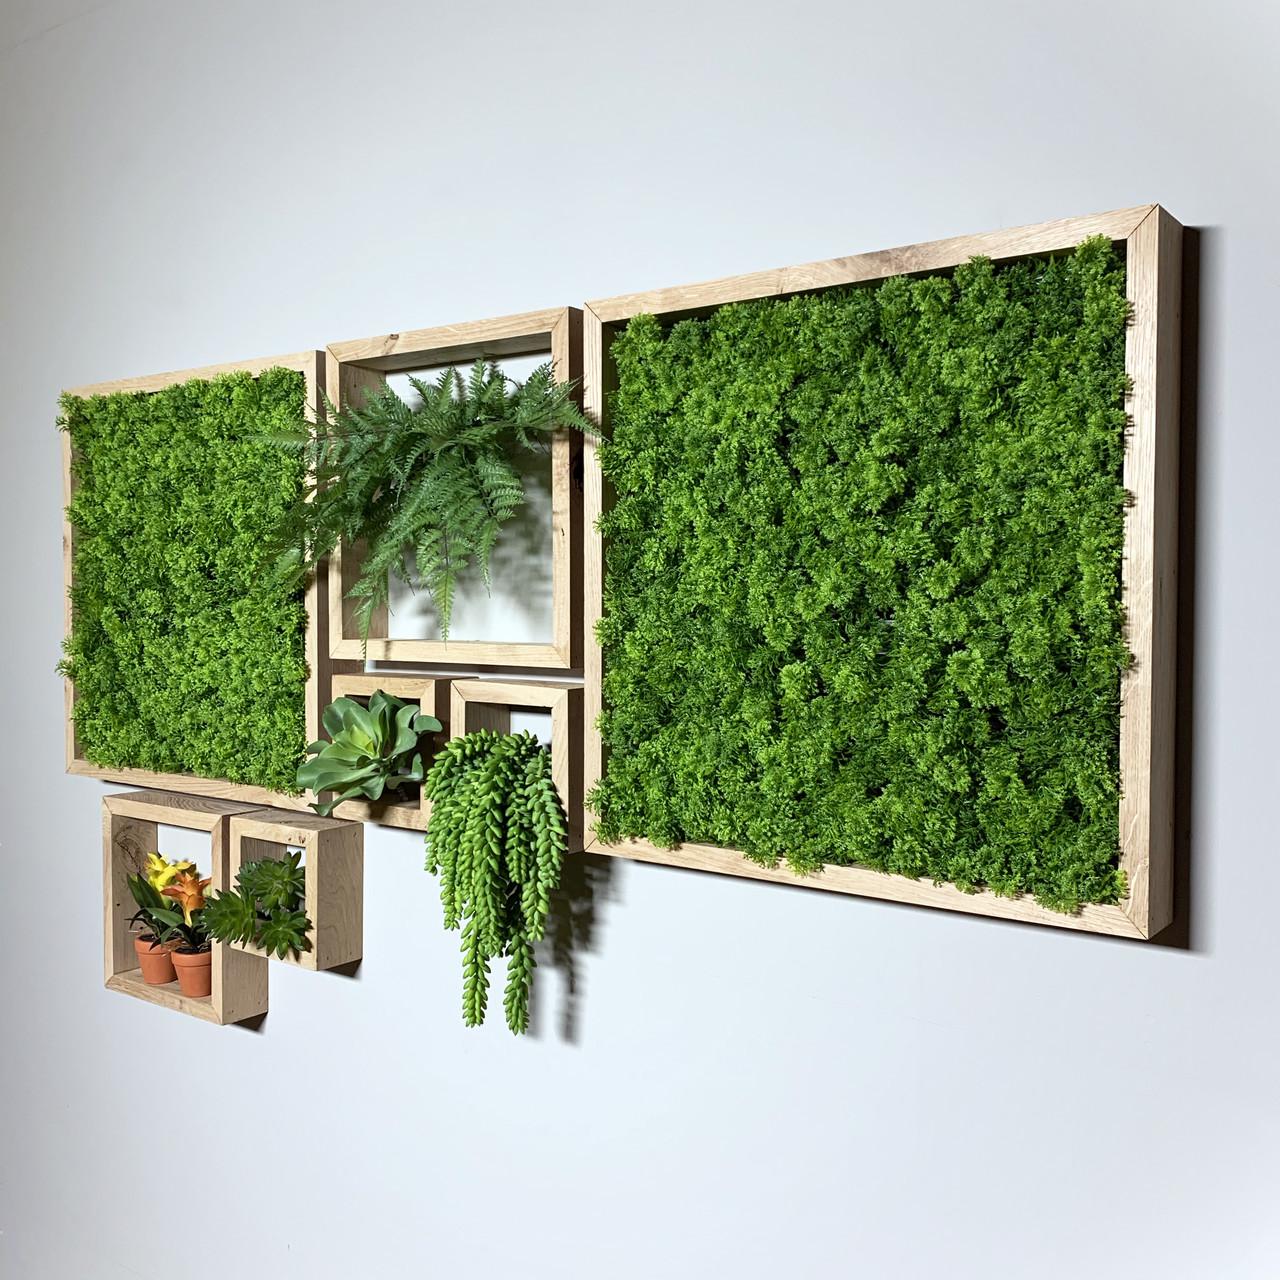 Plantenwanden